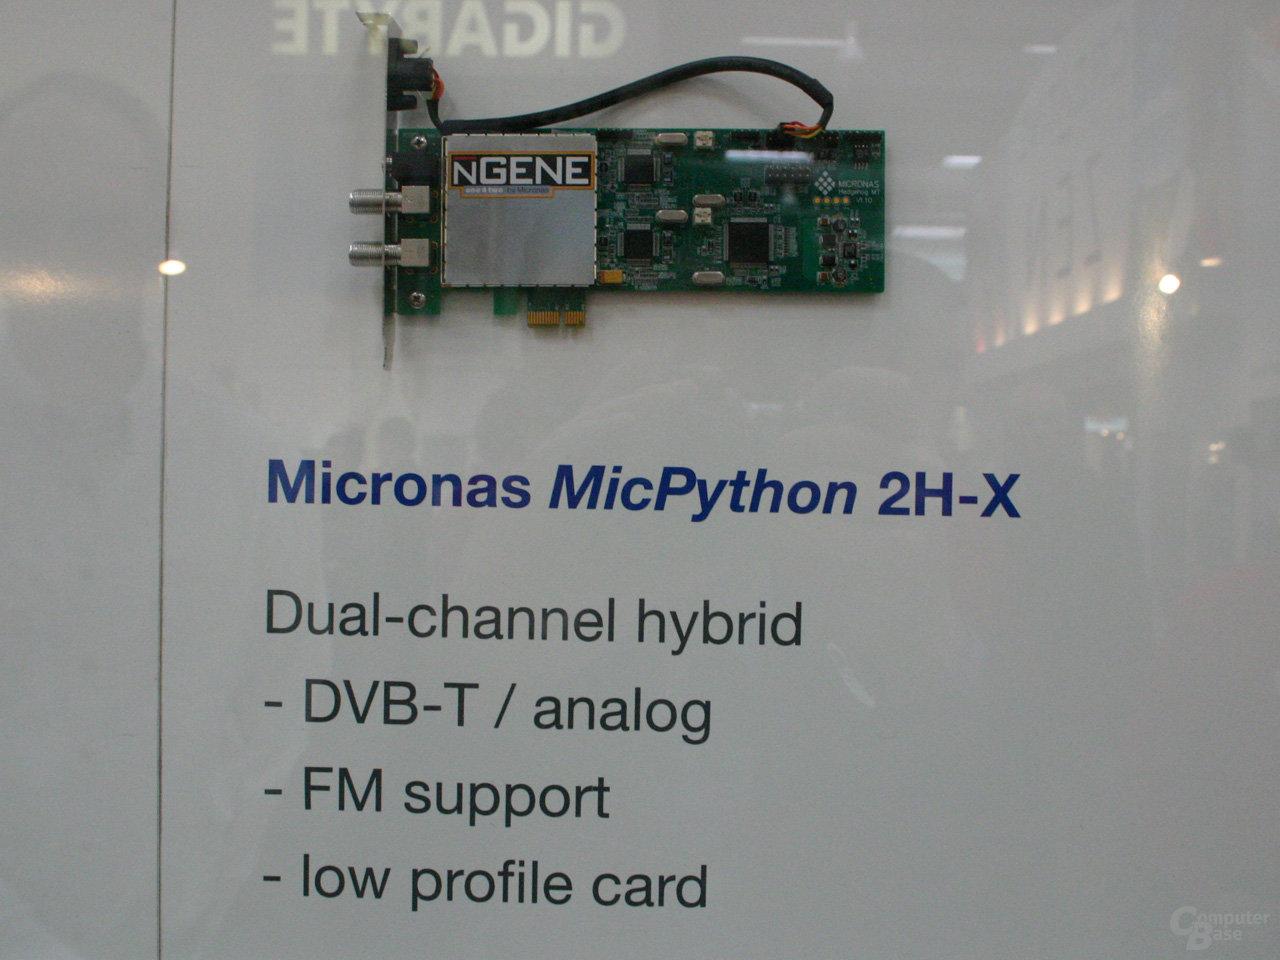 Micronas MicPython 2H-X Referenzdesign für DVB-T